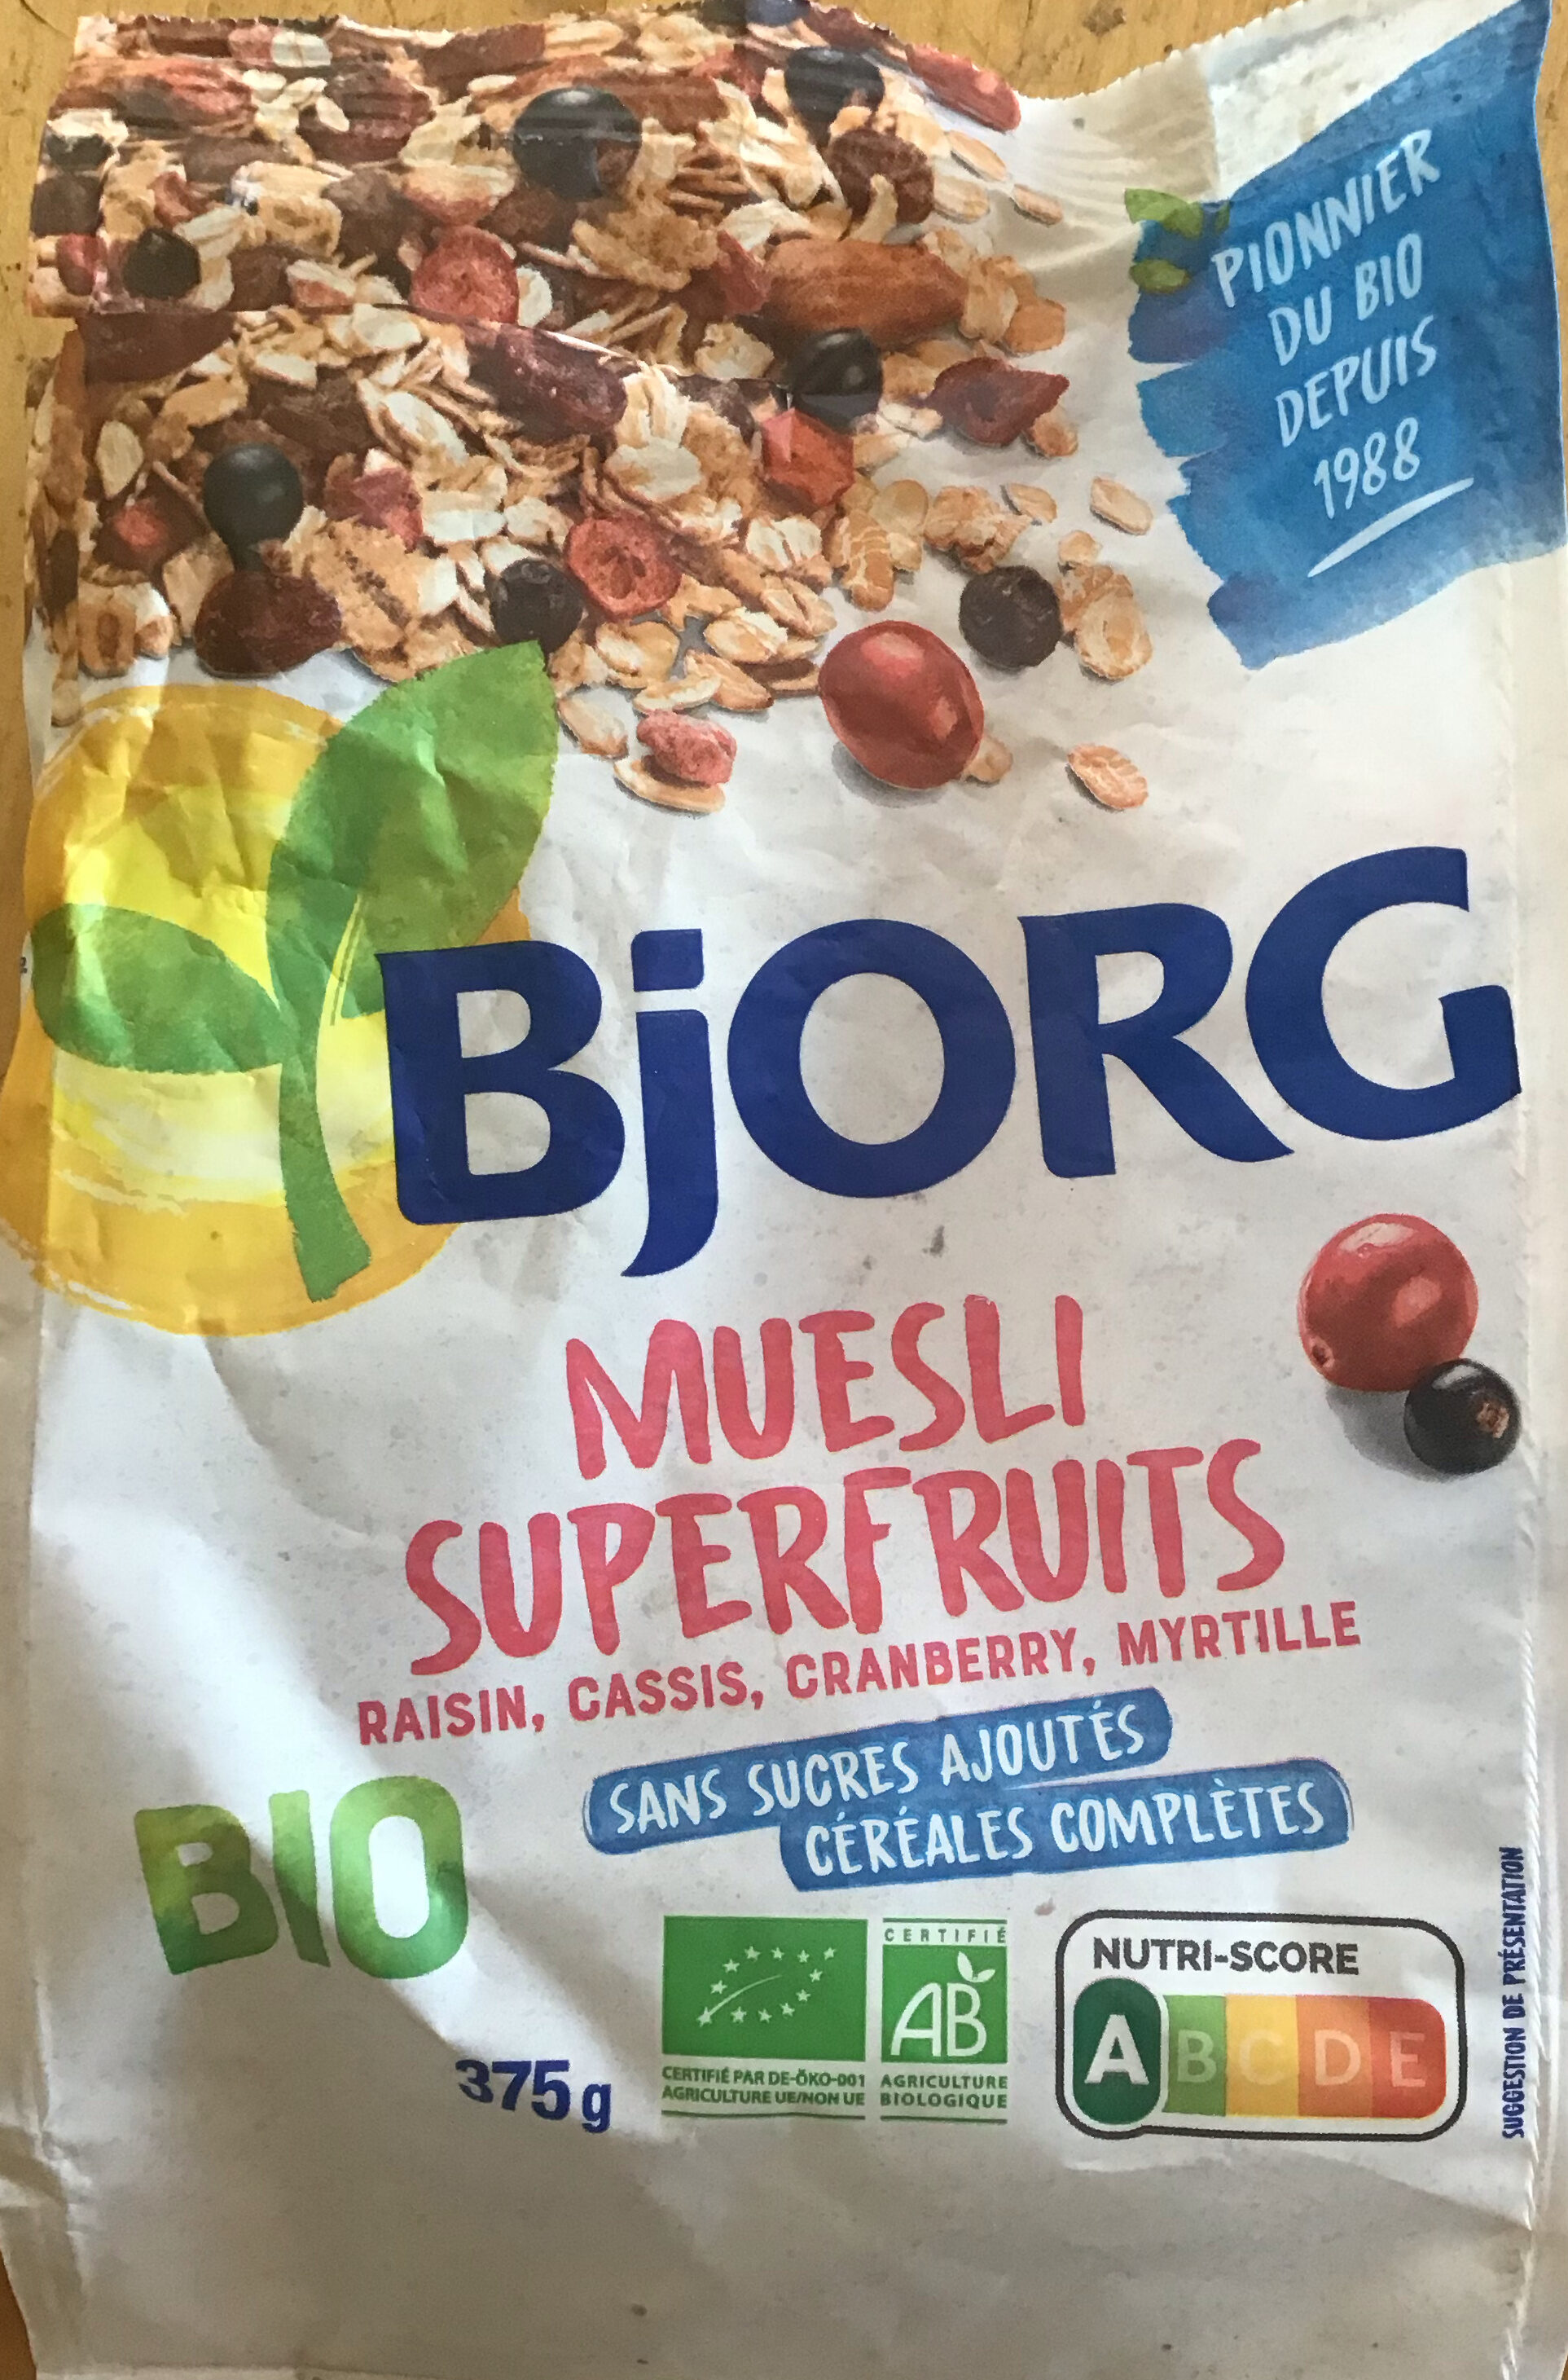 Muesli Superfruits Raisin Cassis Cranberry Myrtille - Prodotto - fr